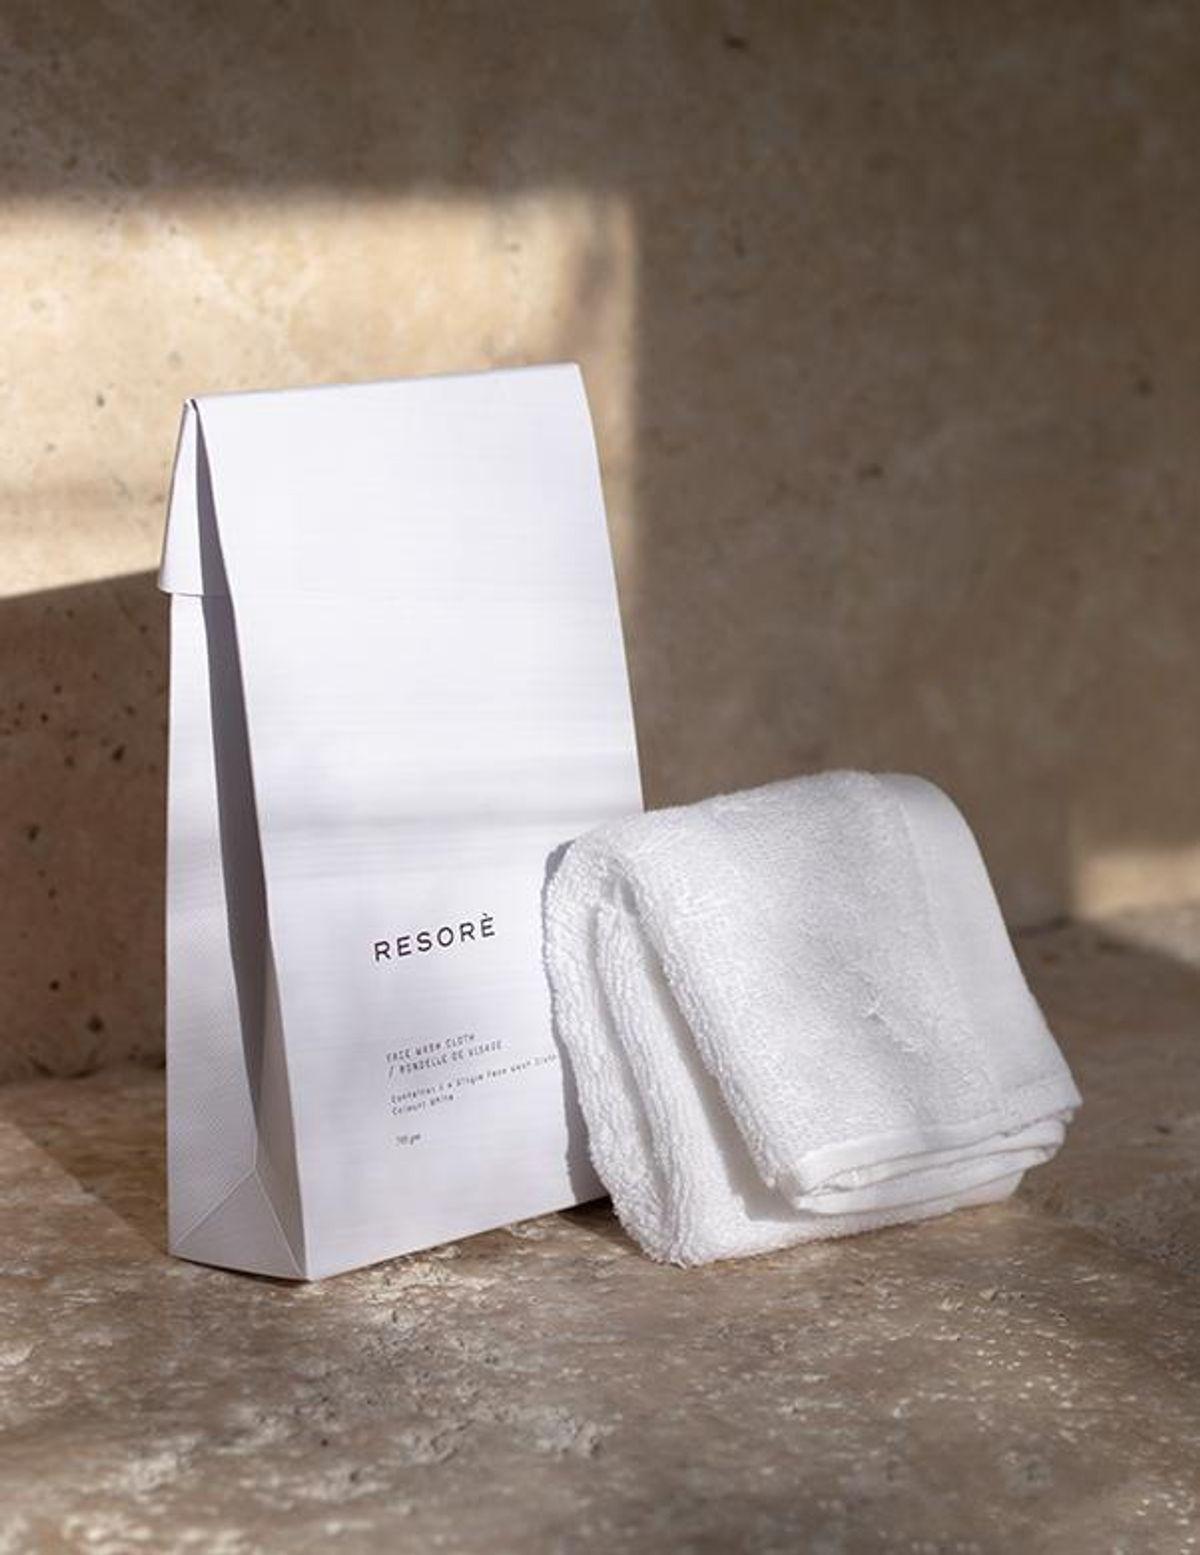 resore face towel